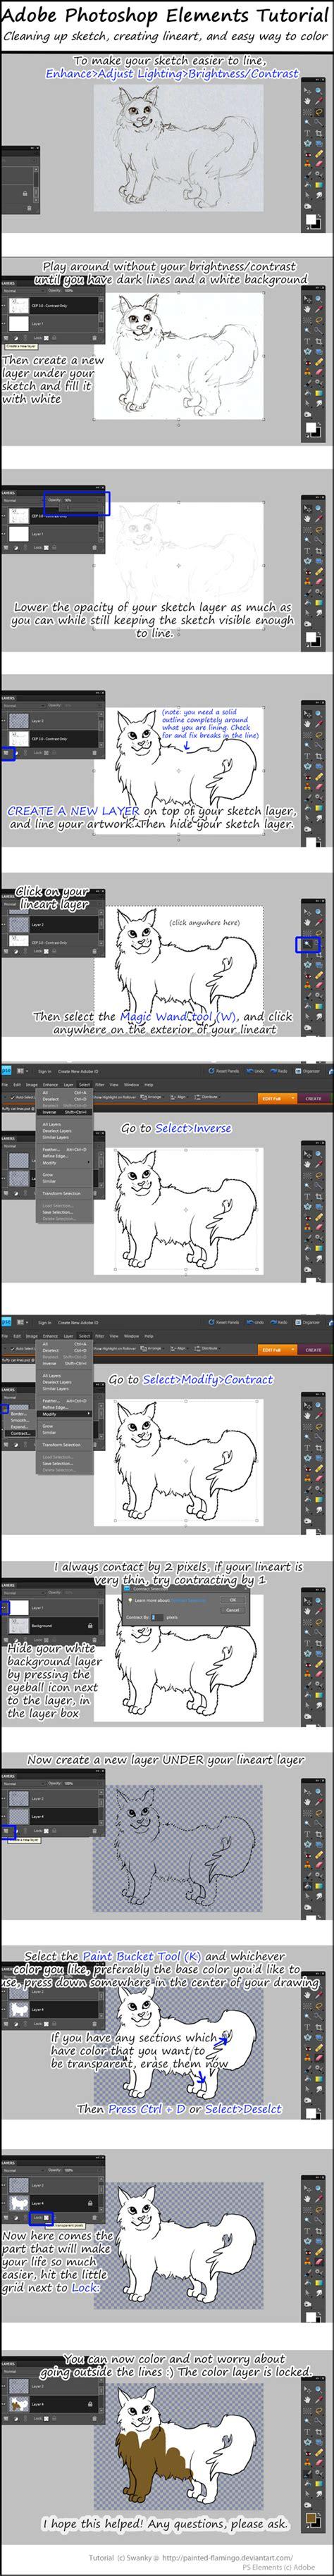 tutorial adobe photoshop elements 5 0 adobe photoshop elements tutorial lineart color by